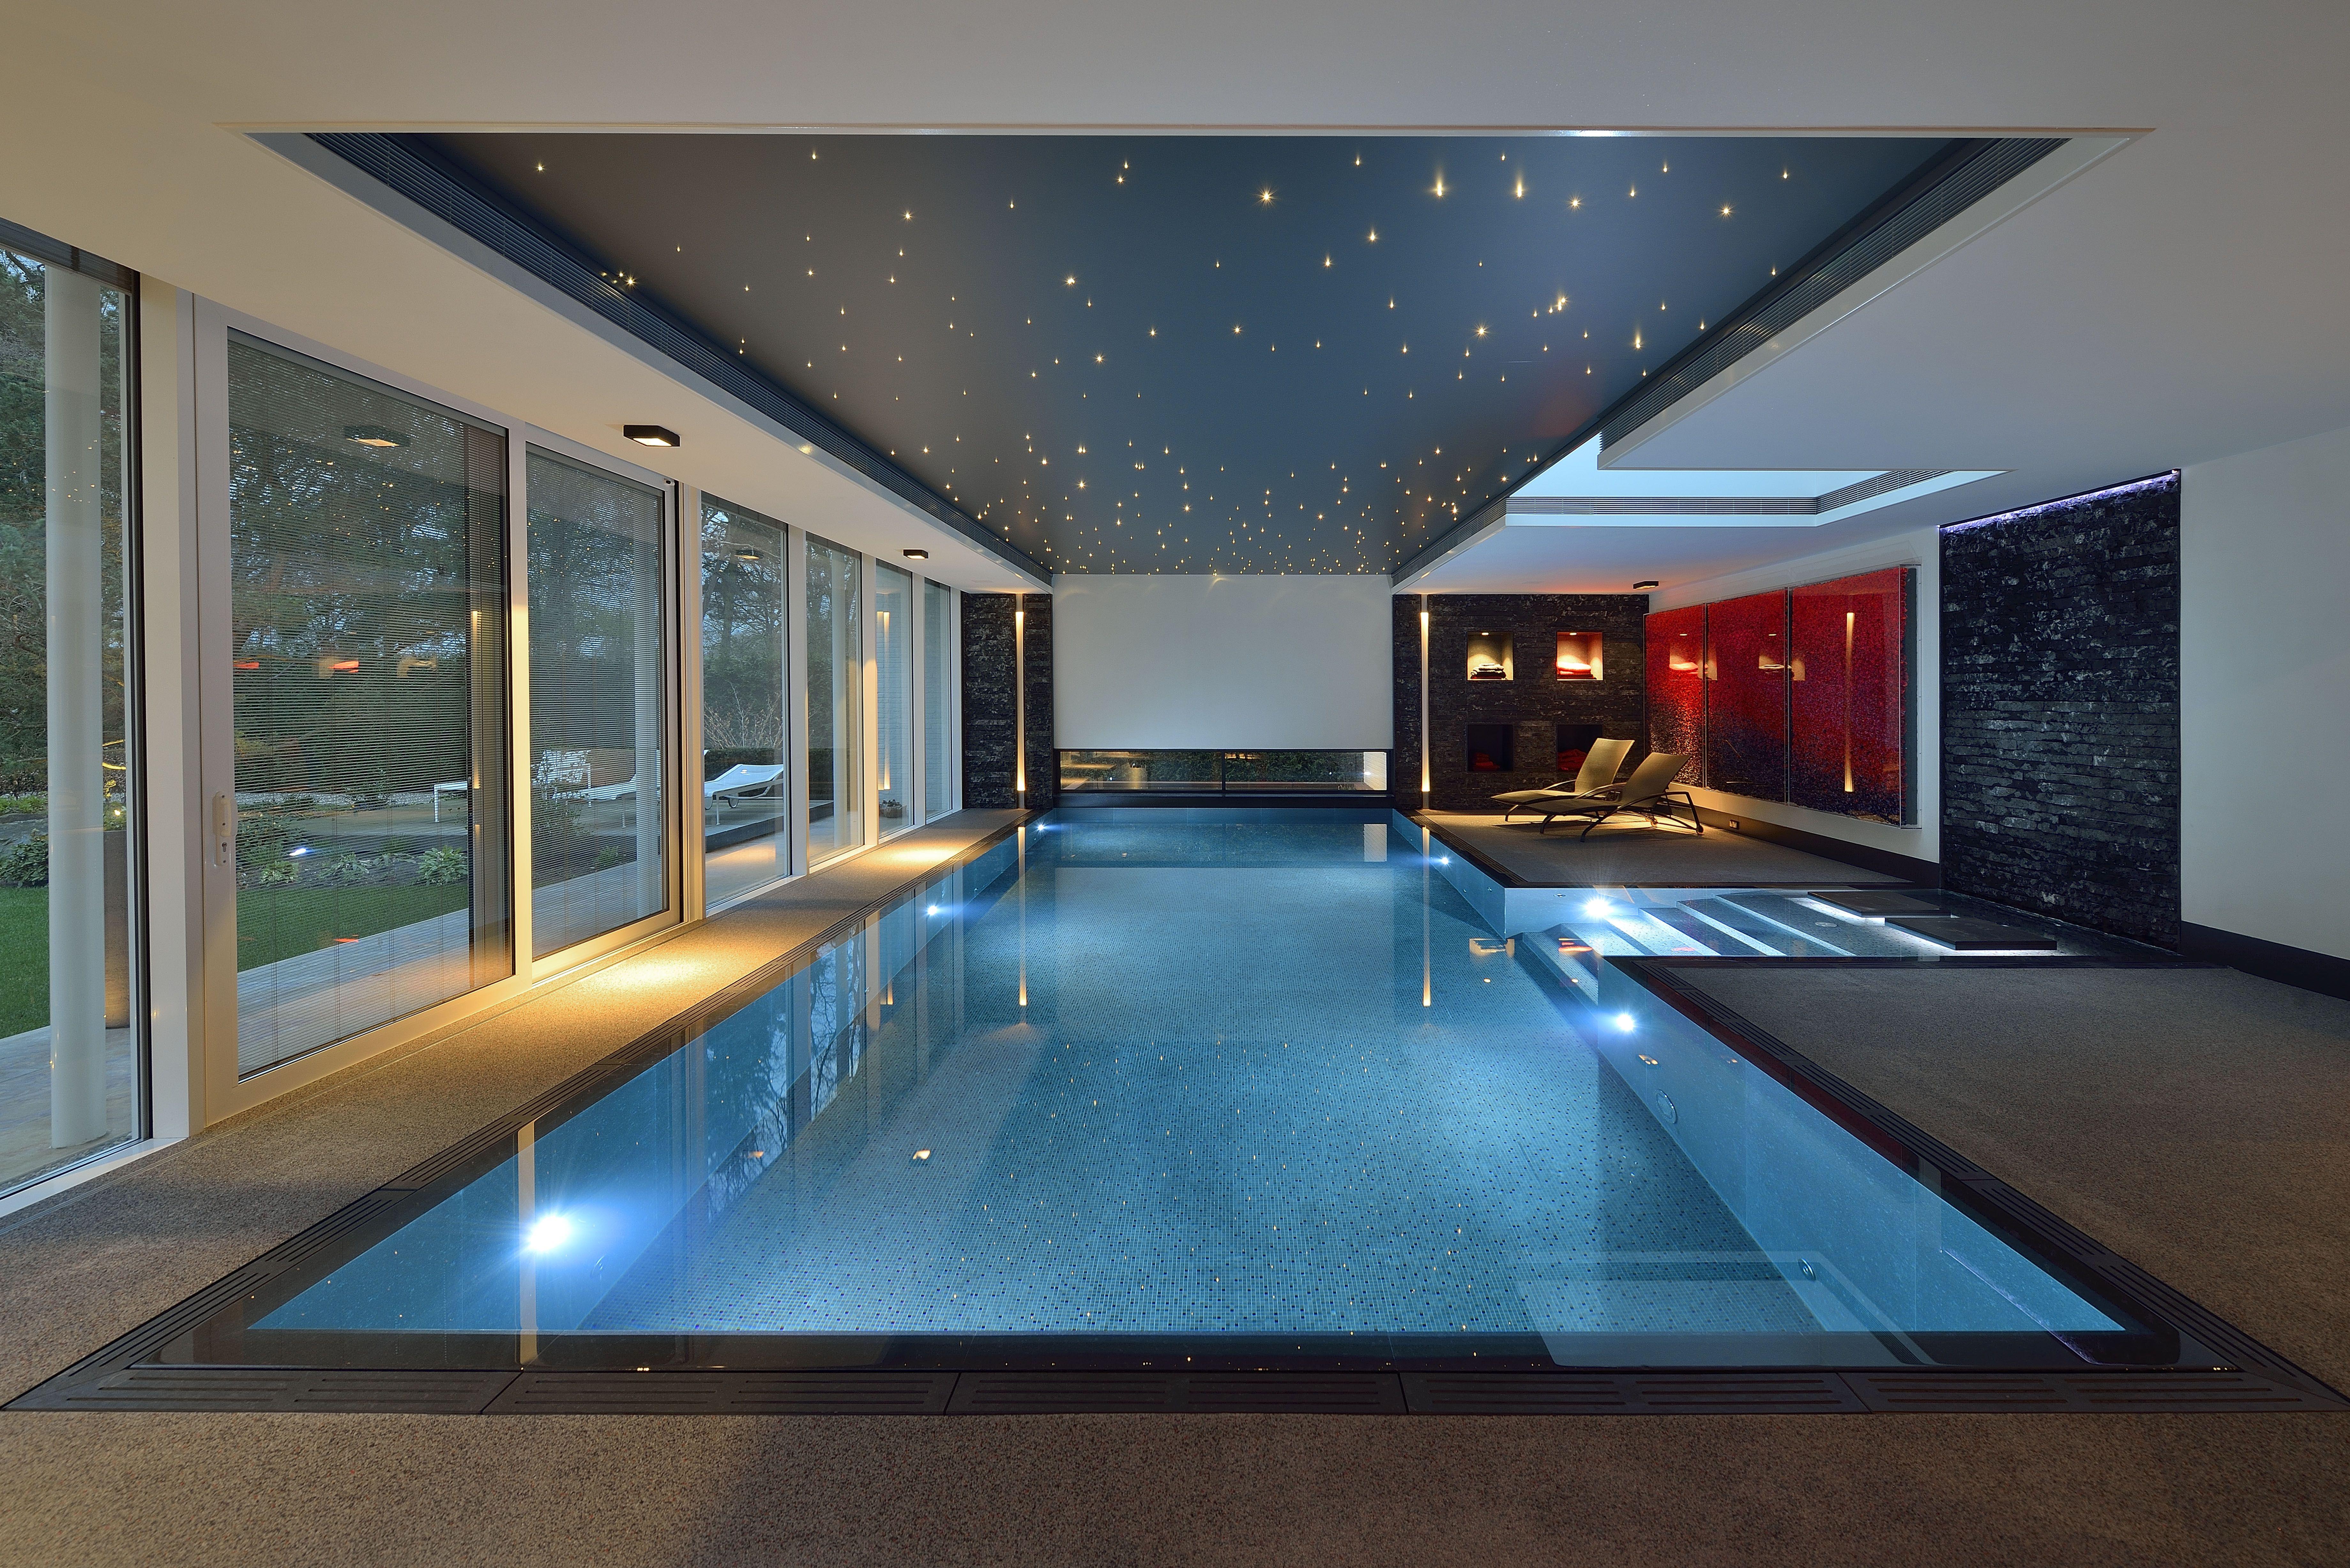 Domotica swimmingpool domotica zwembad binnenzwembad villa